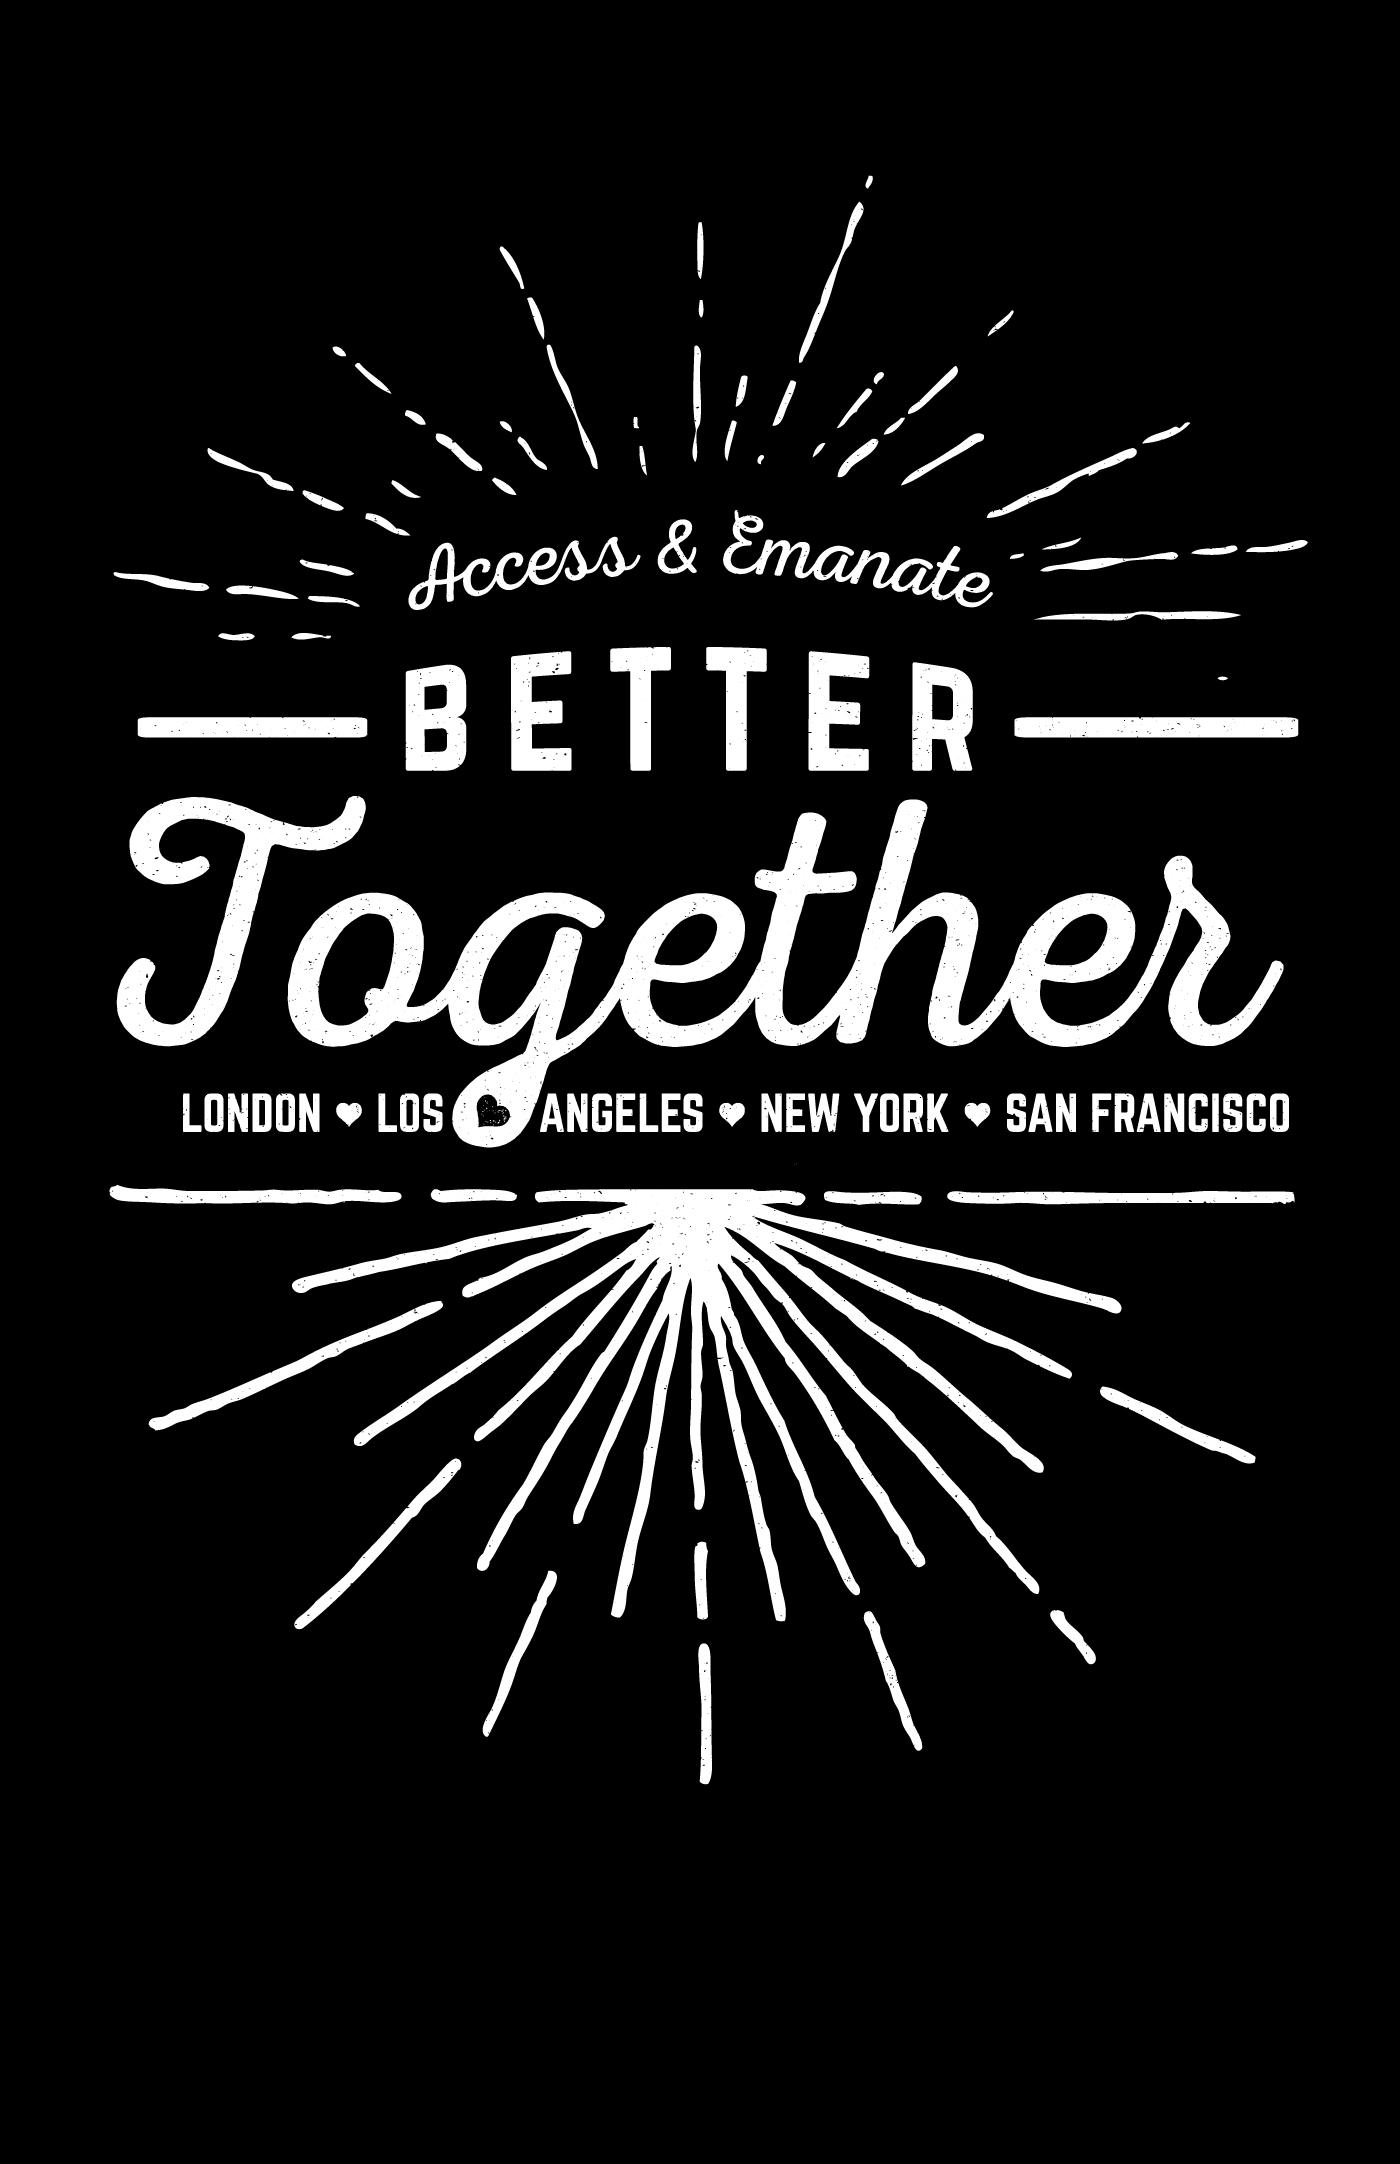 graphic design  ILLUSTRATION  typography   apparel Fashion  t-shirt